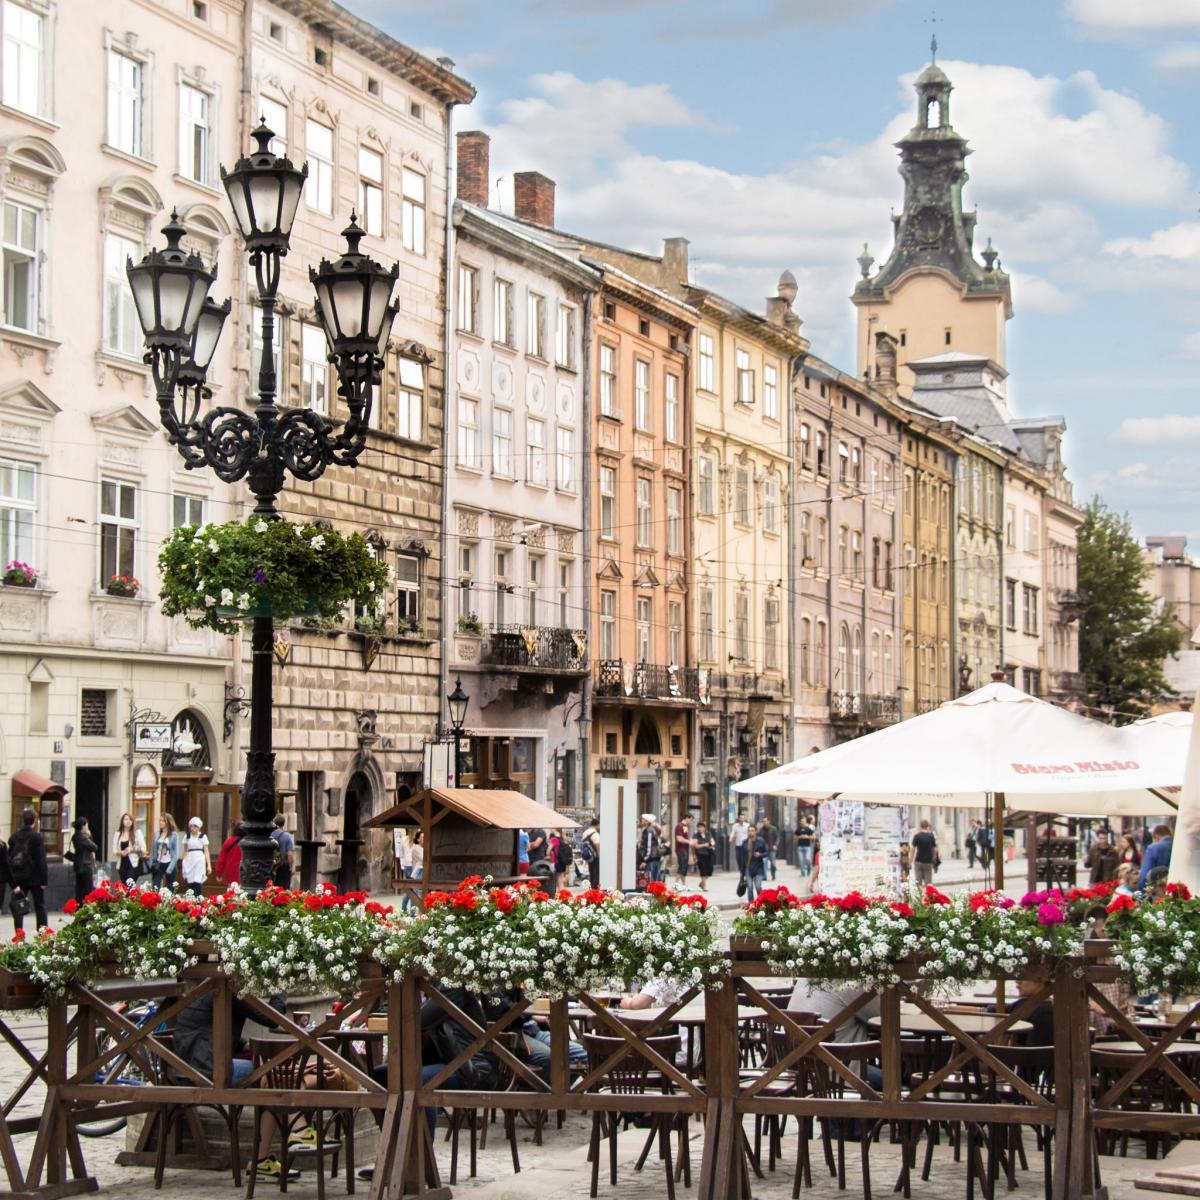 Тур по Украине: День Независимости во Львове